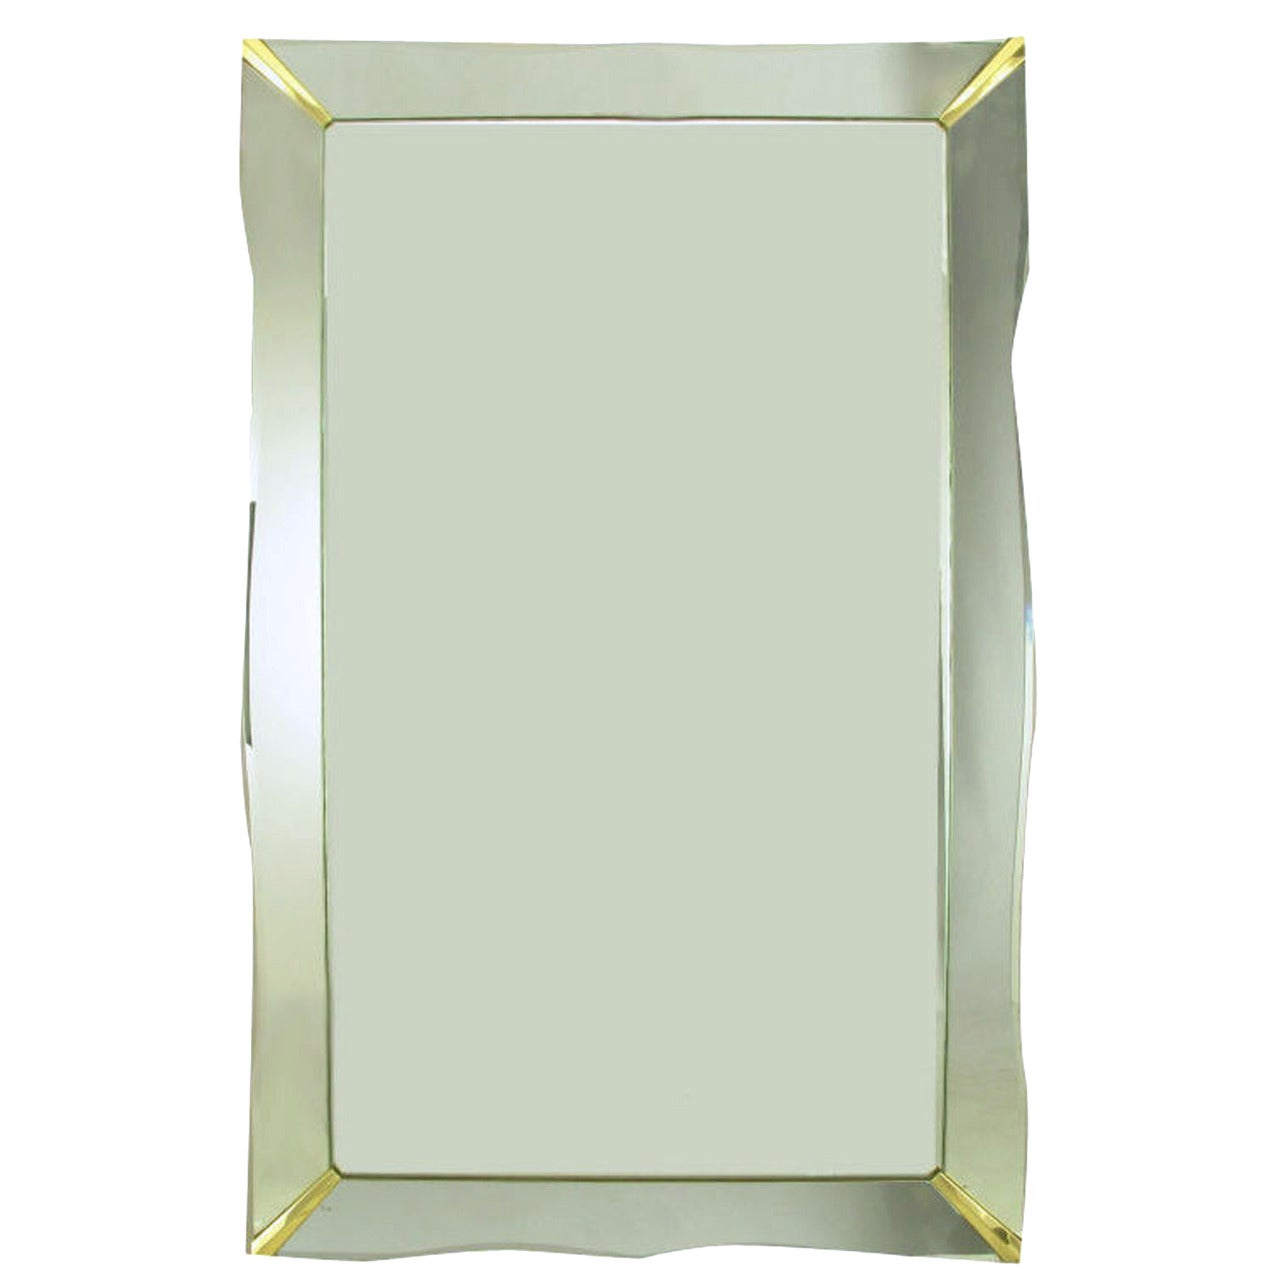 1940s Era Art Deco Scalloped Edge Mirror Framed Mirror